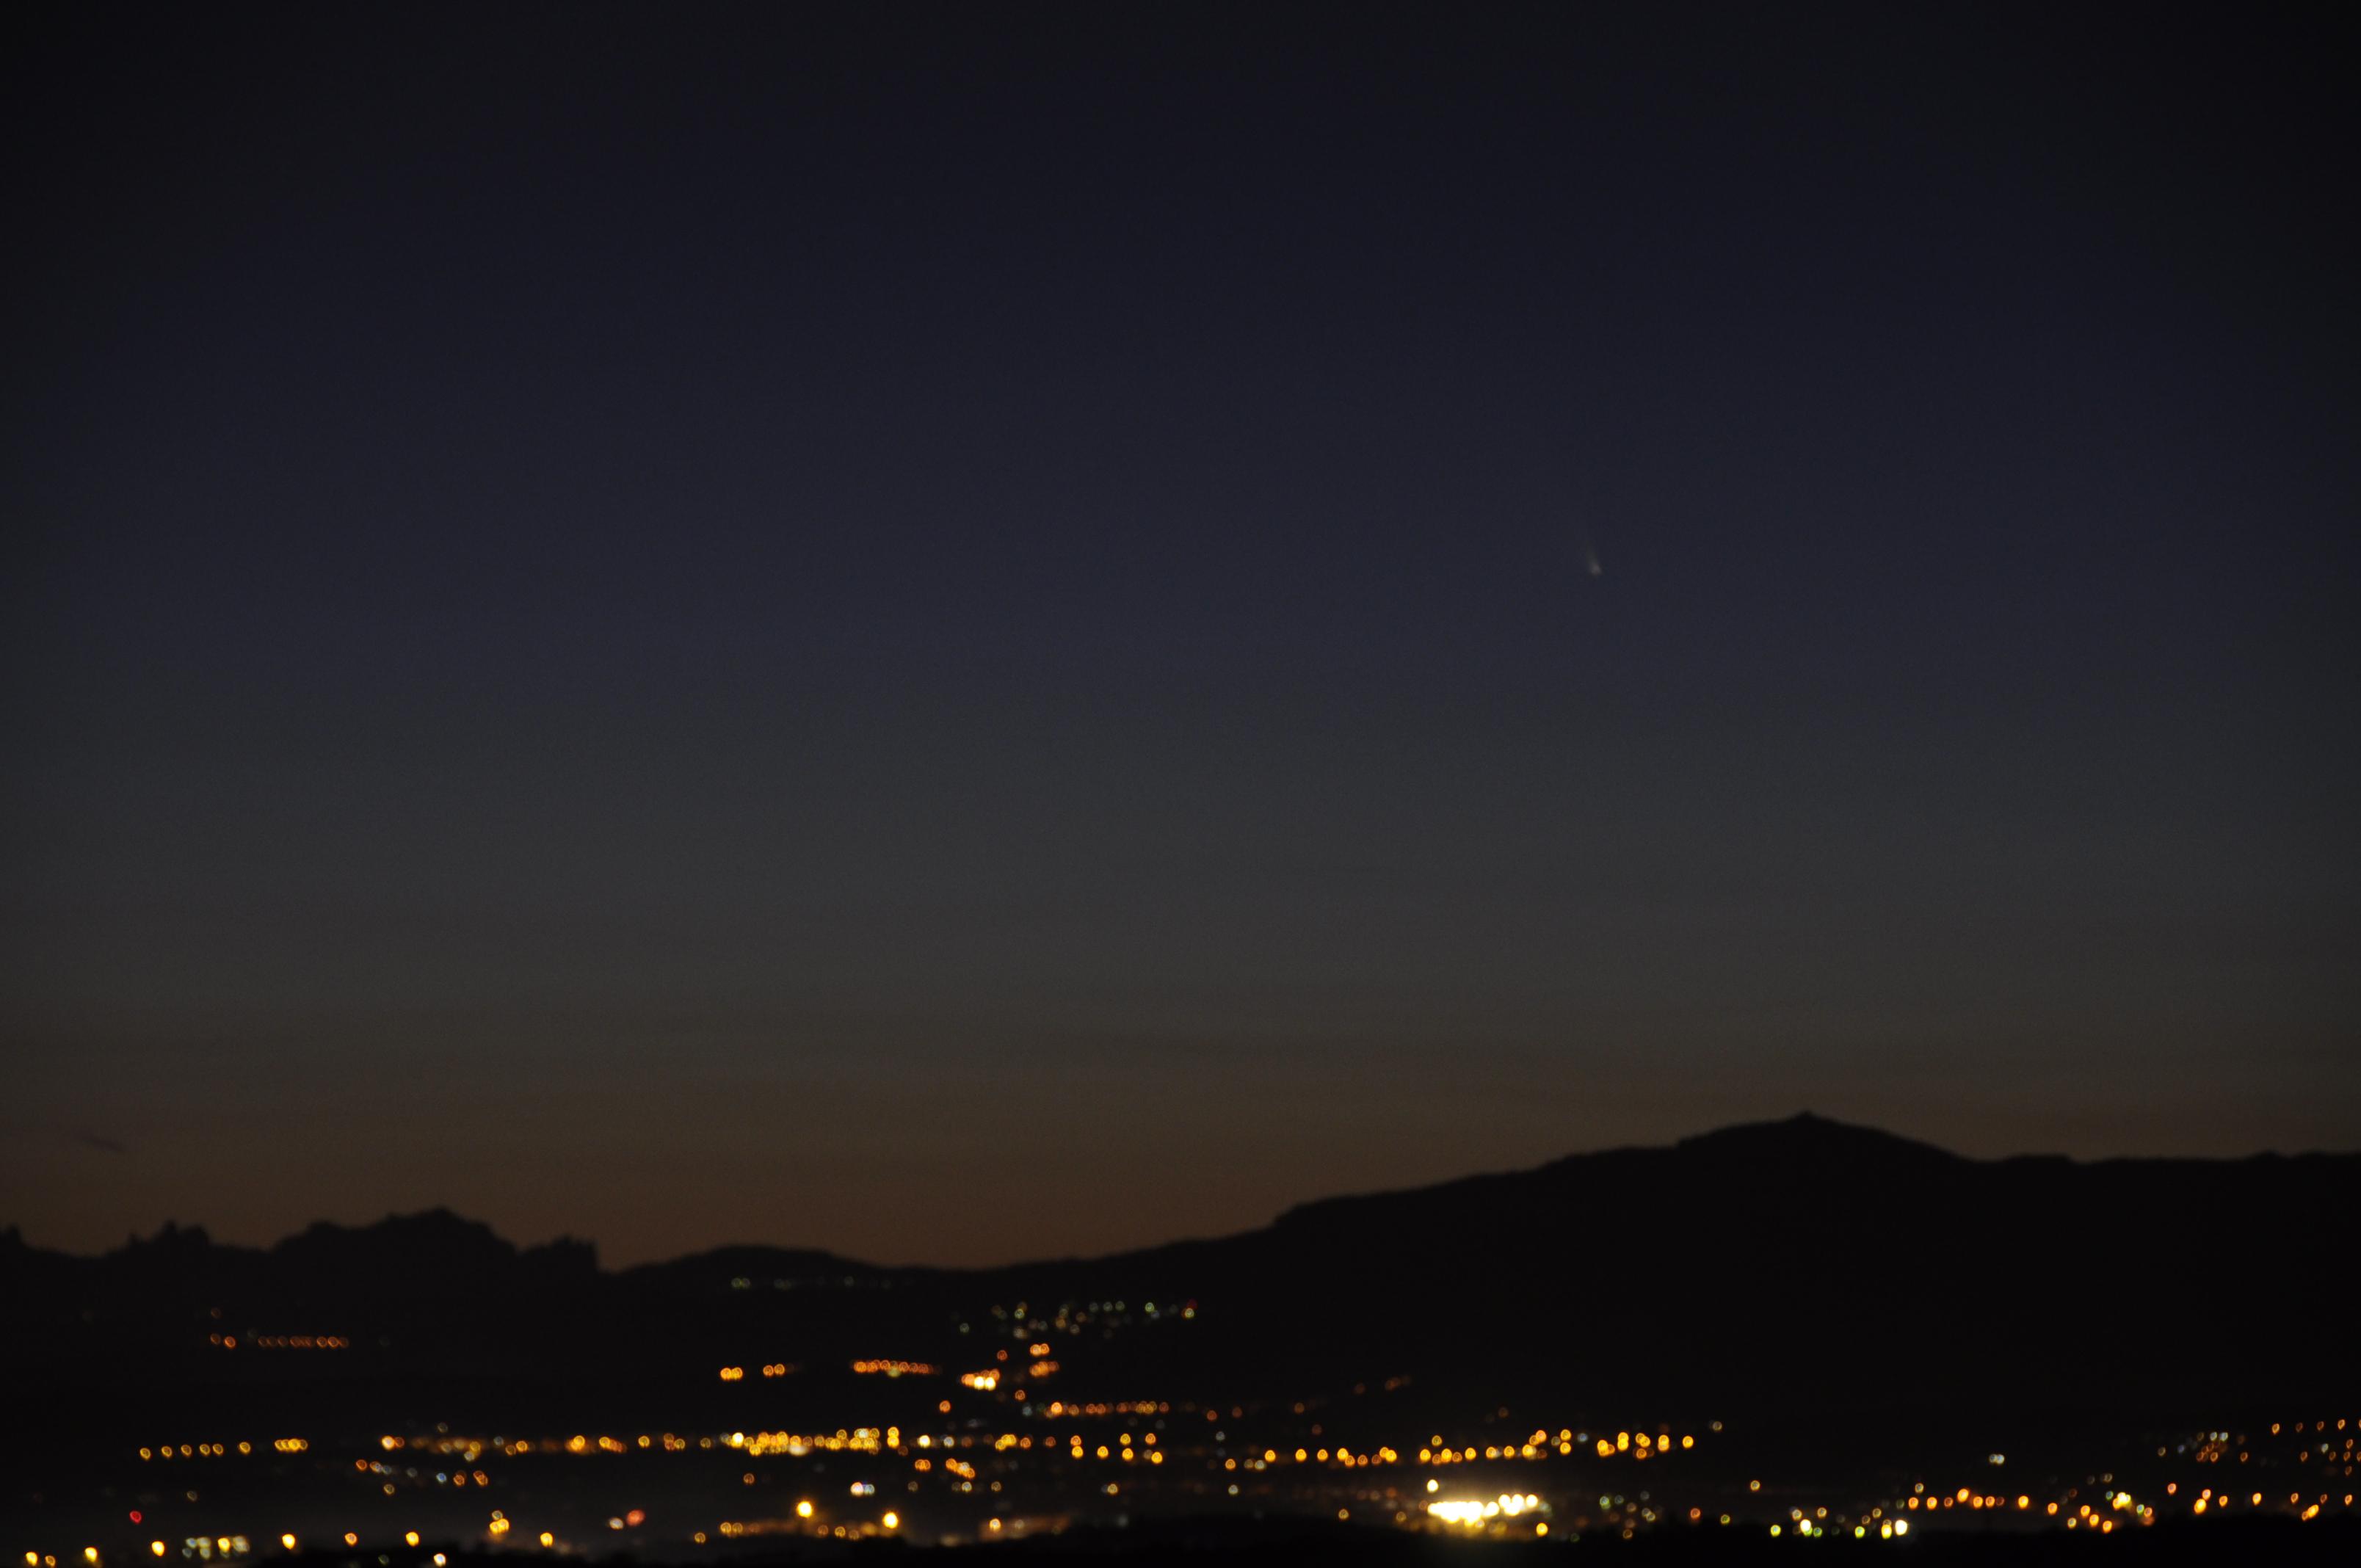 Cometa C/2011 L4 des de Dosrius. Carles Corney